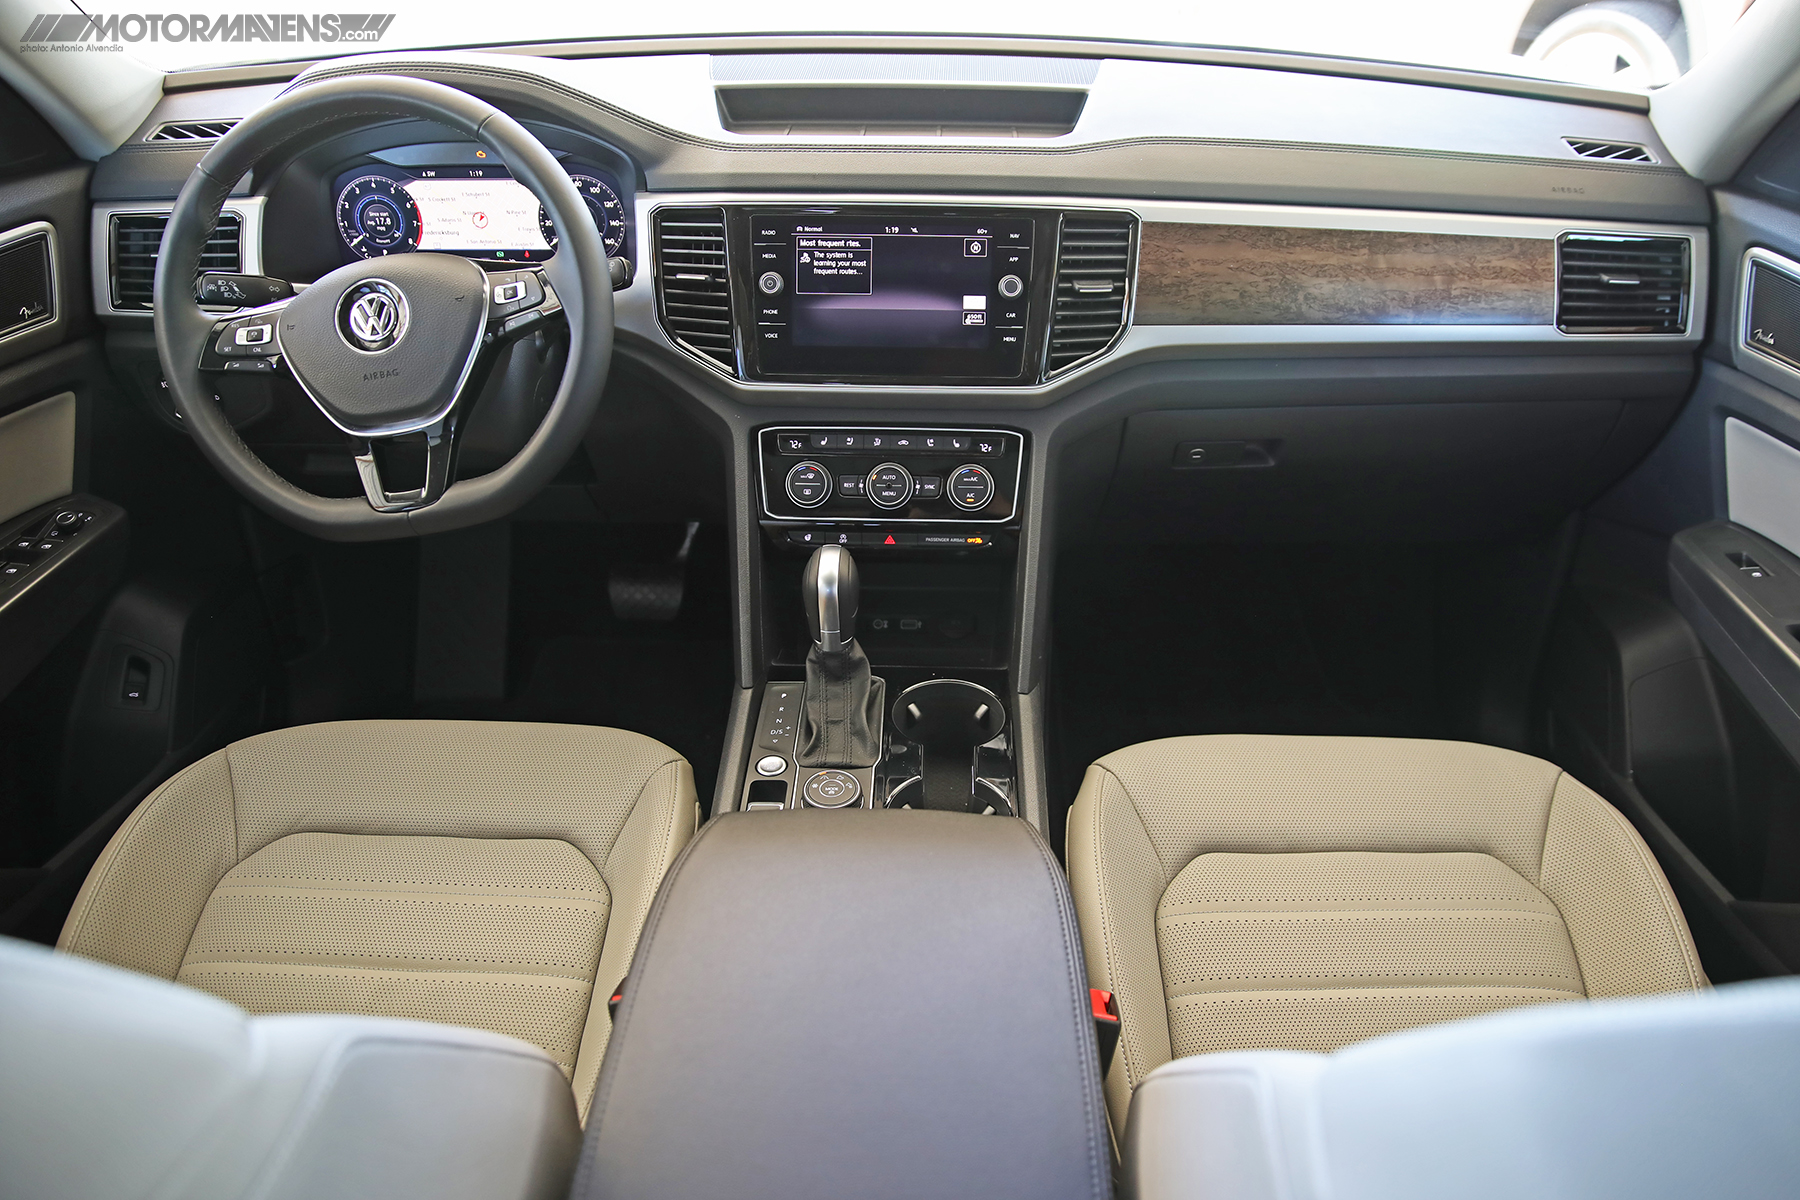 VW Atlas 7 seat 3 row SUV interior 4Motion AWD Turbocharged